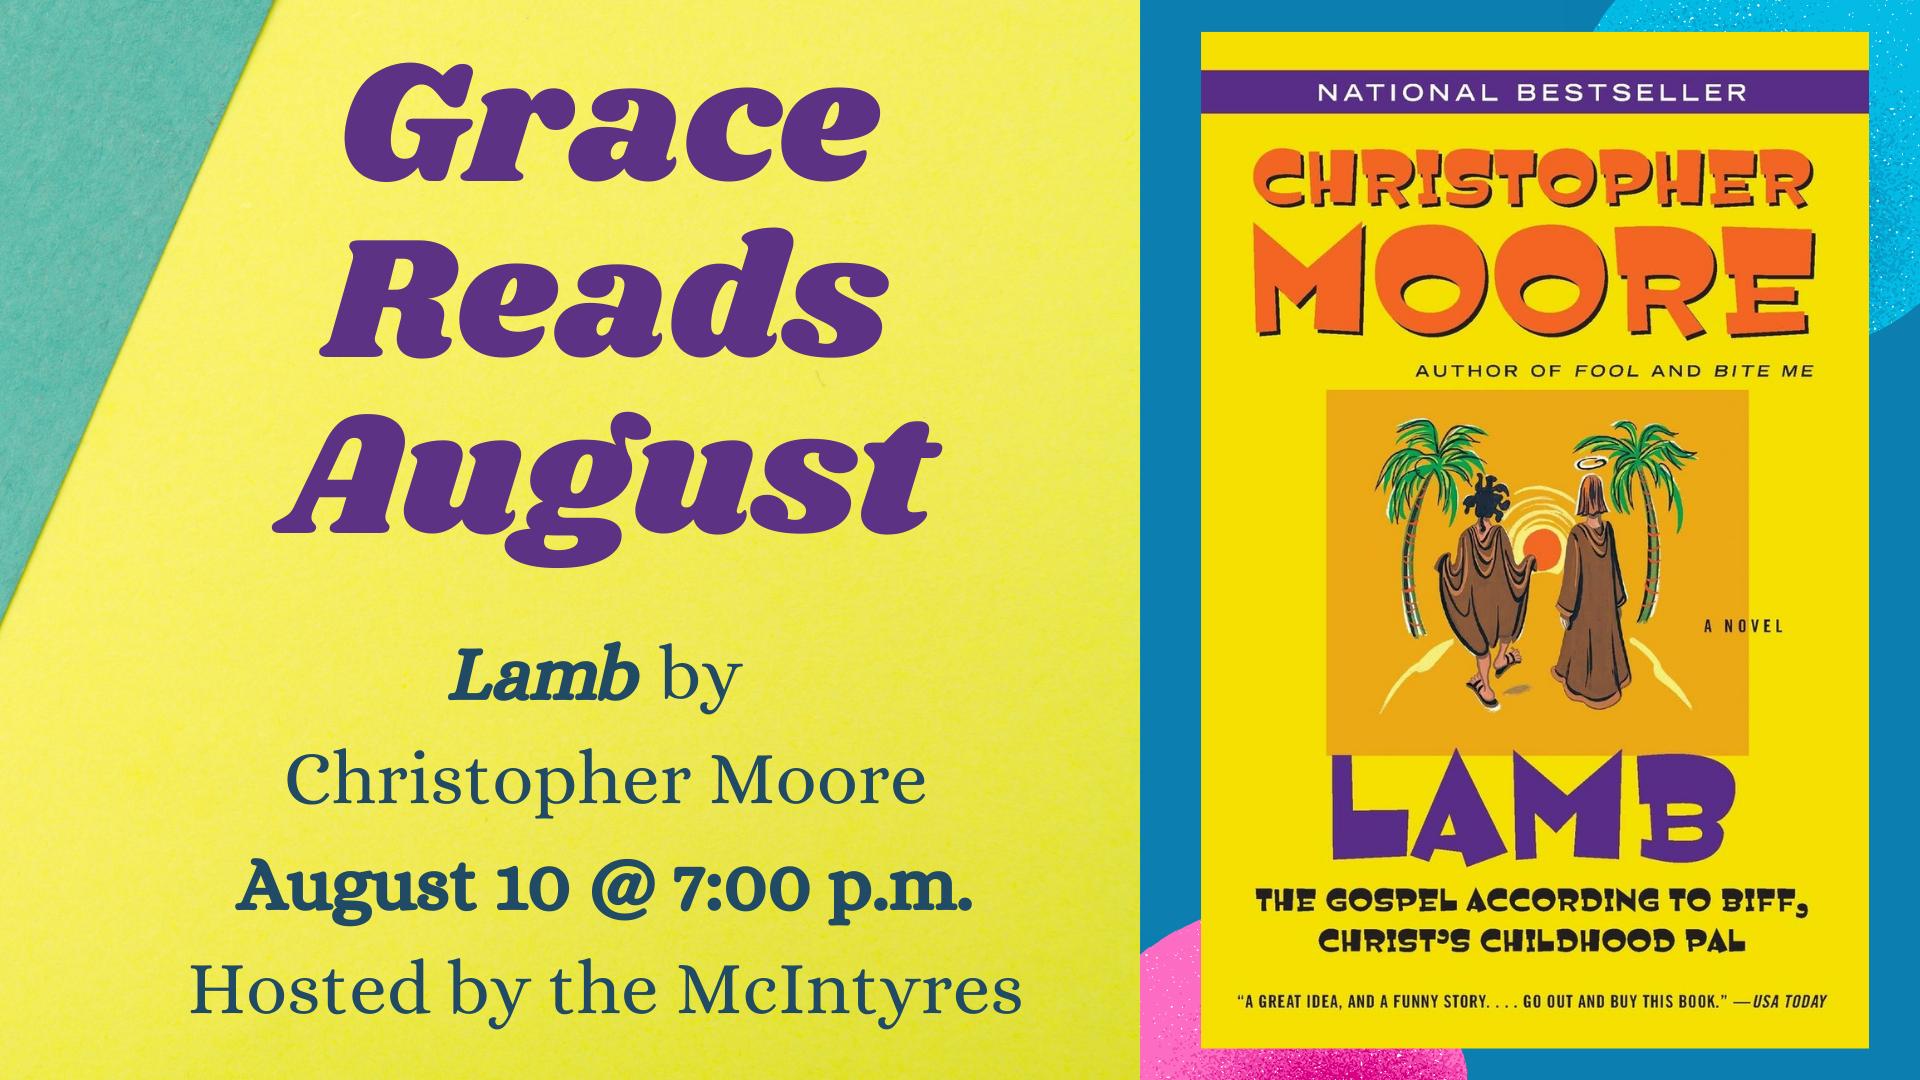 Grace Reads August